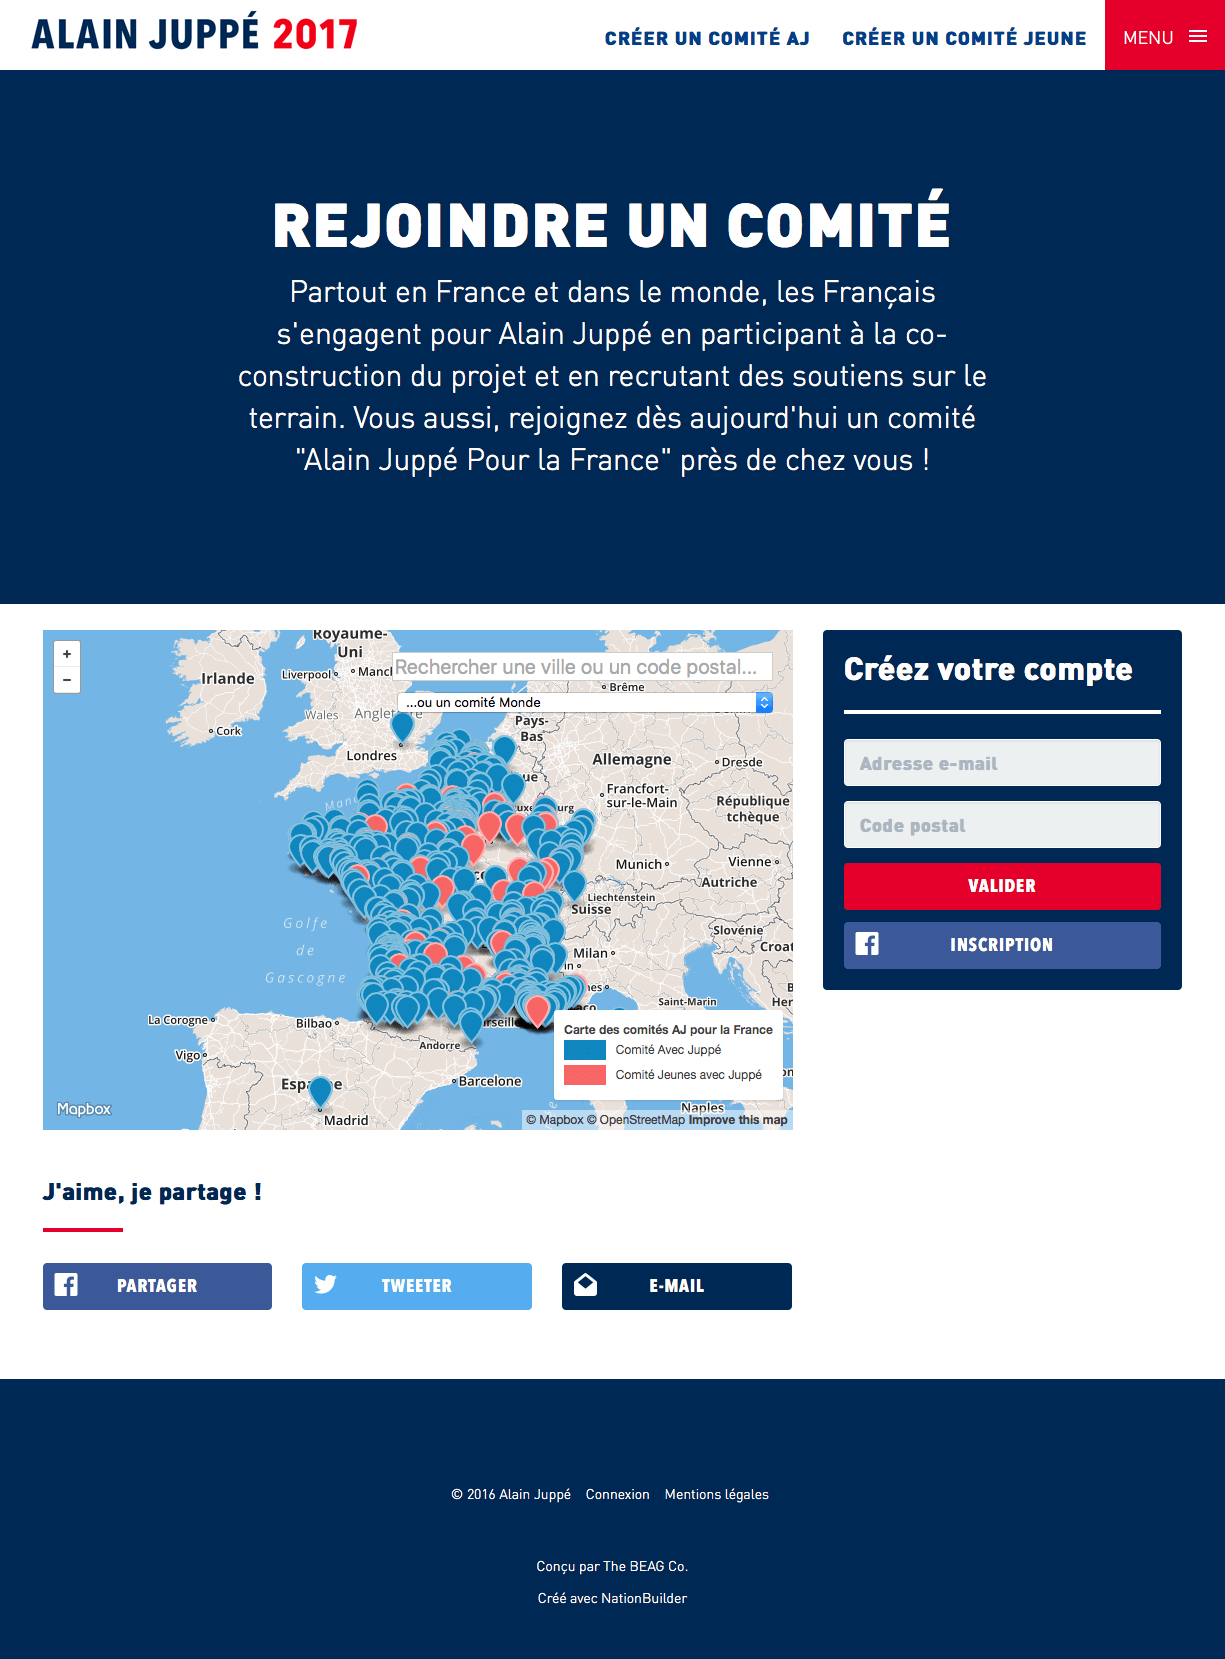 Screenshot: Rejoindre Un Comité